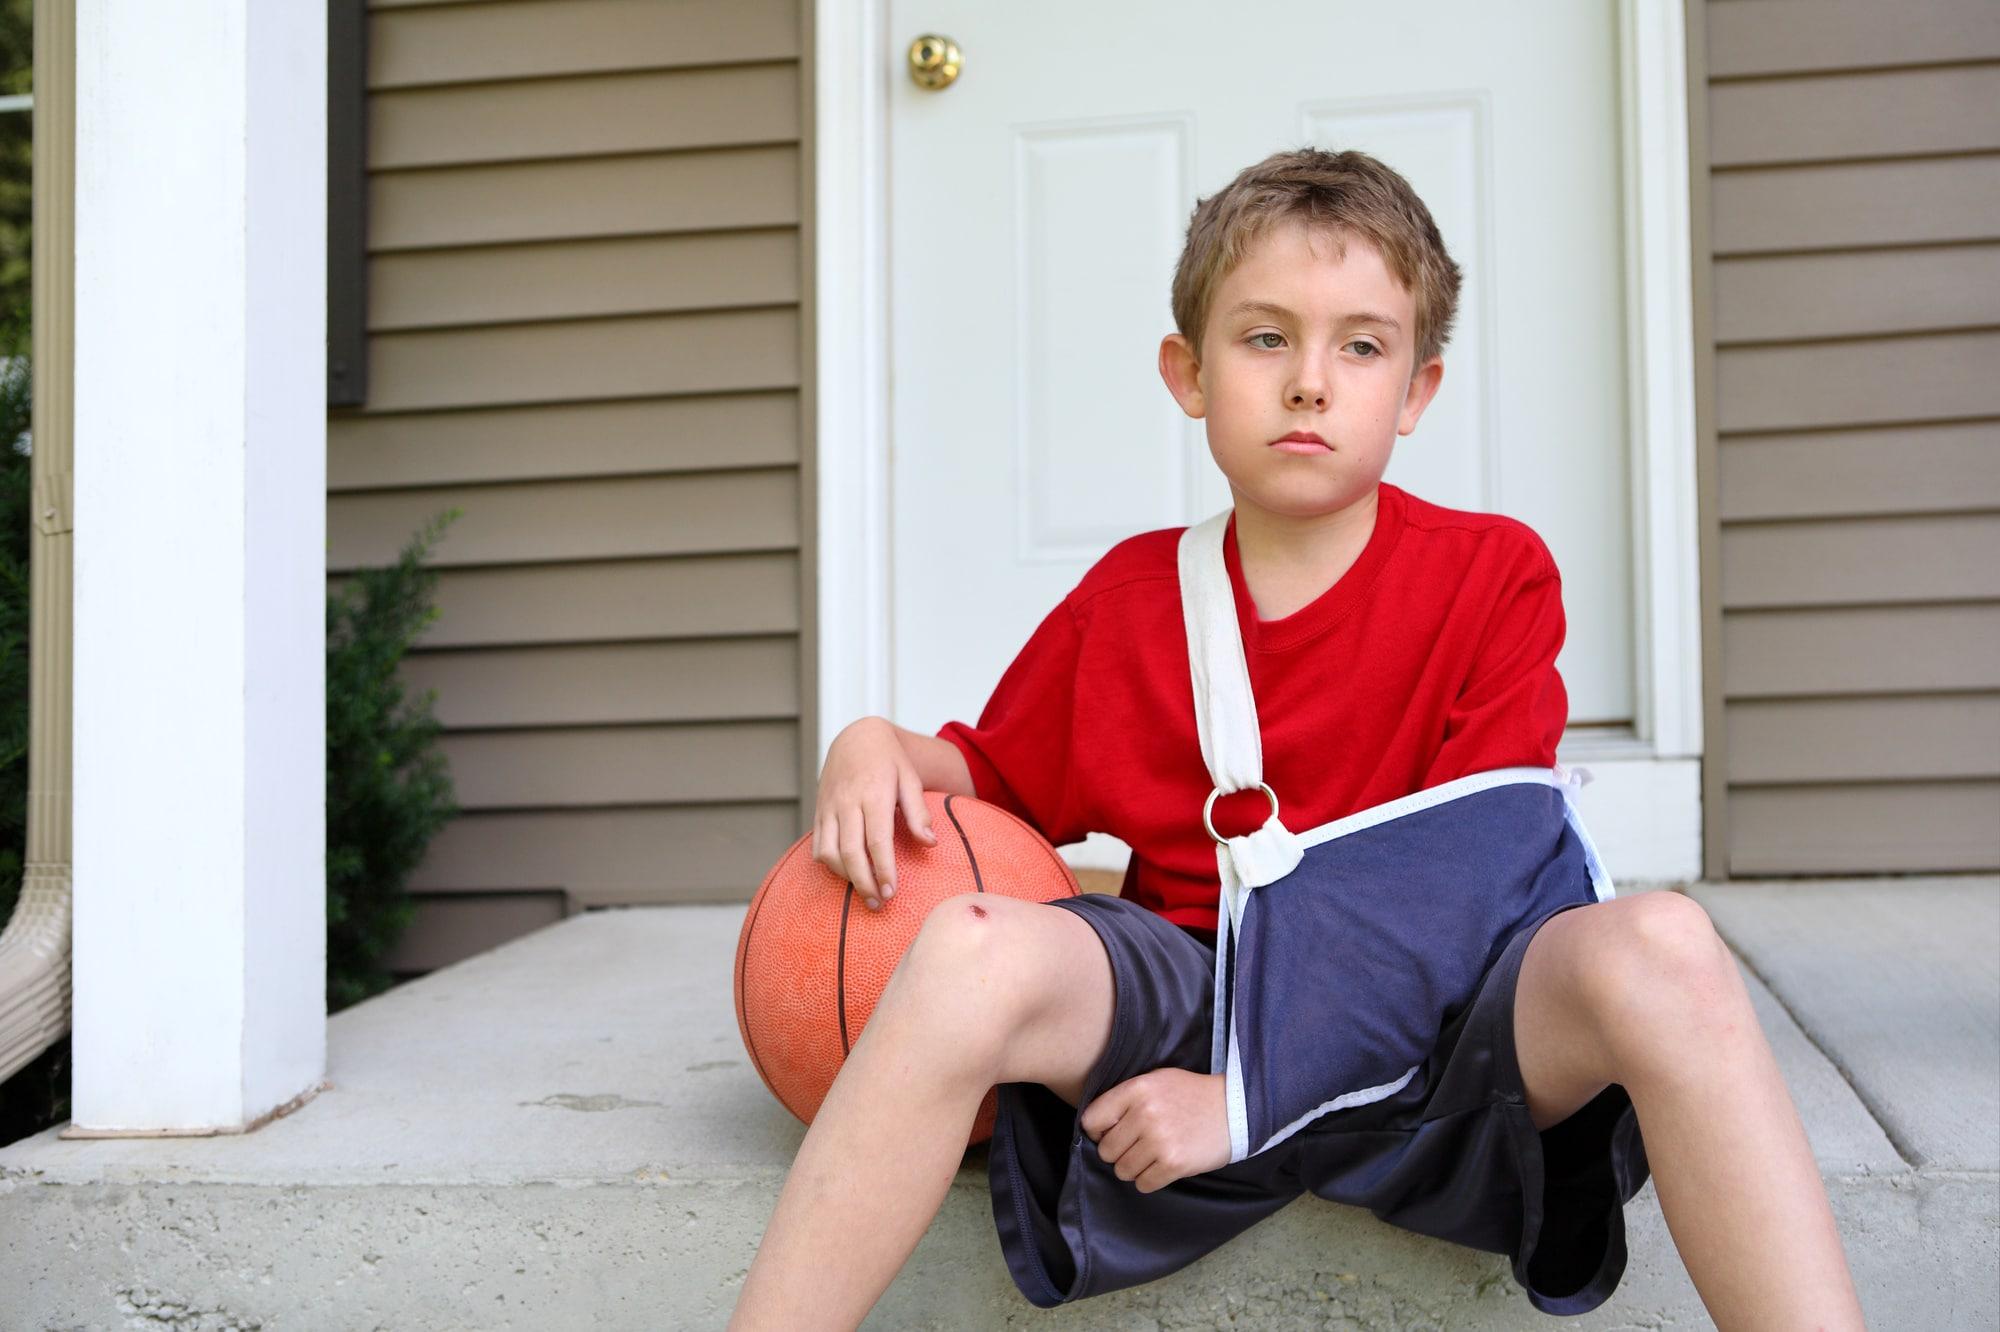 Sprain vs Fracture